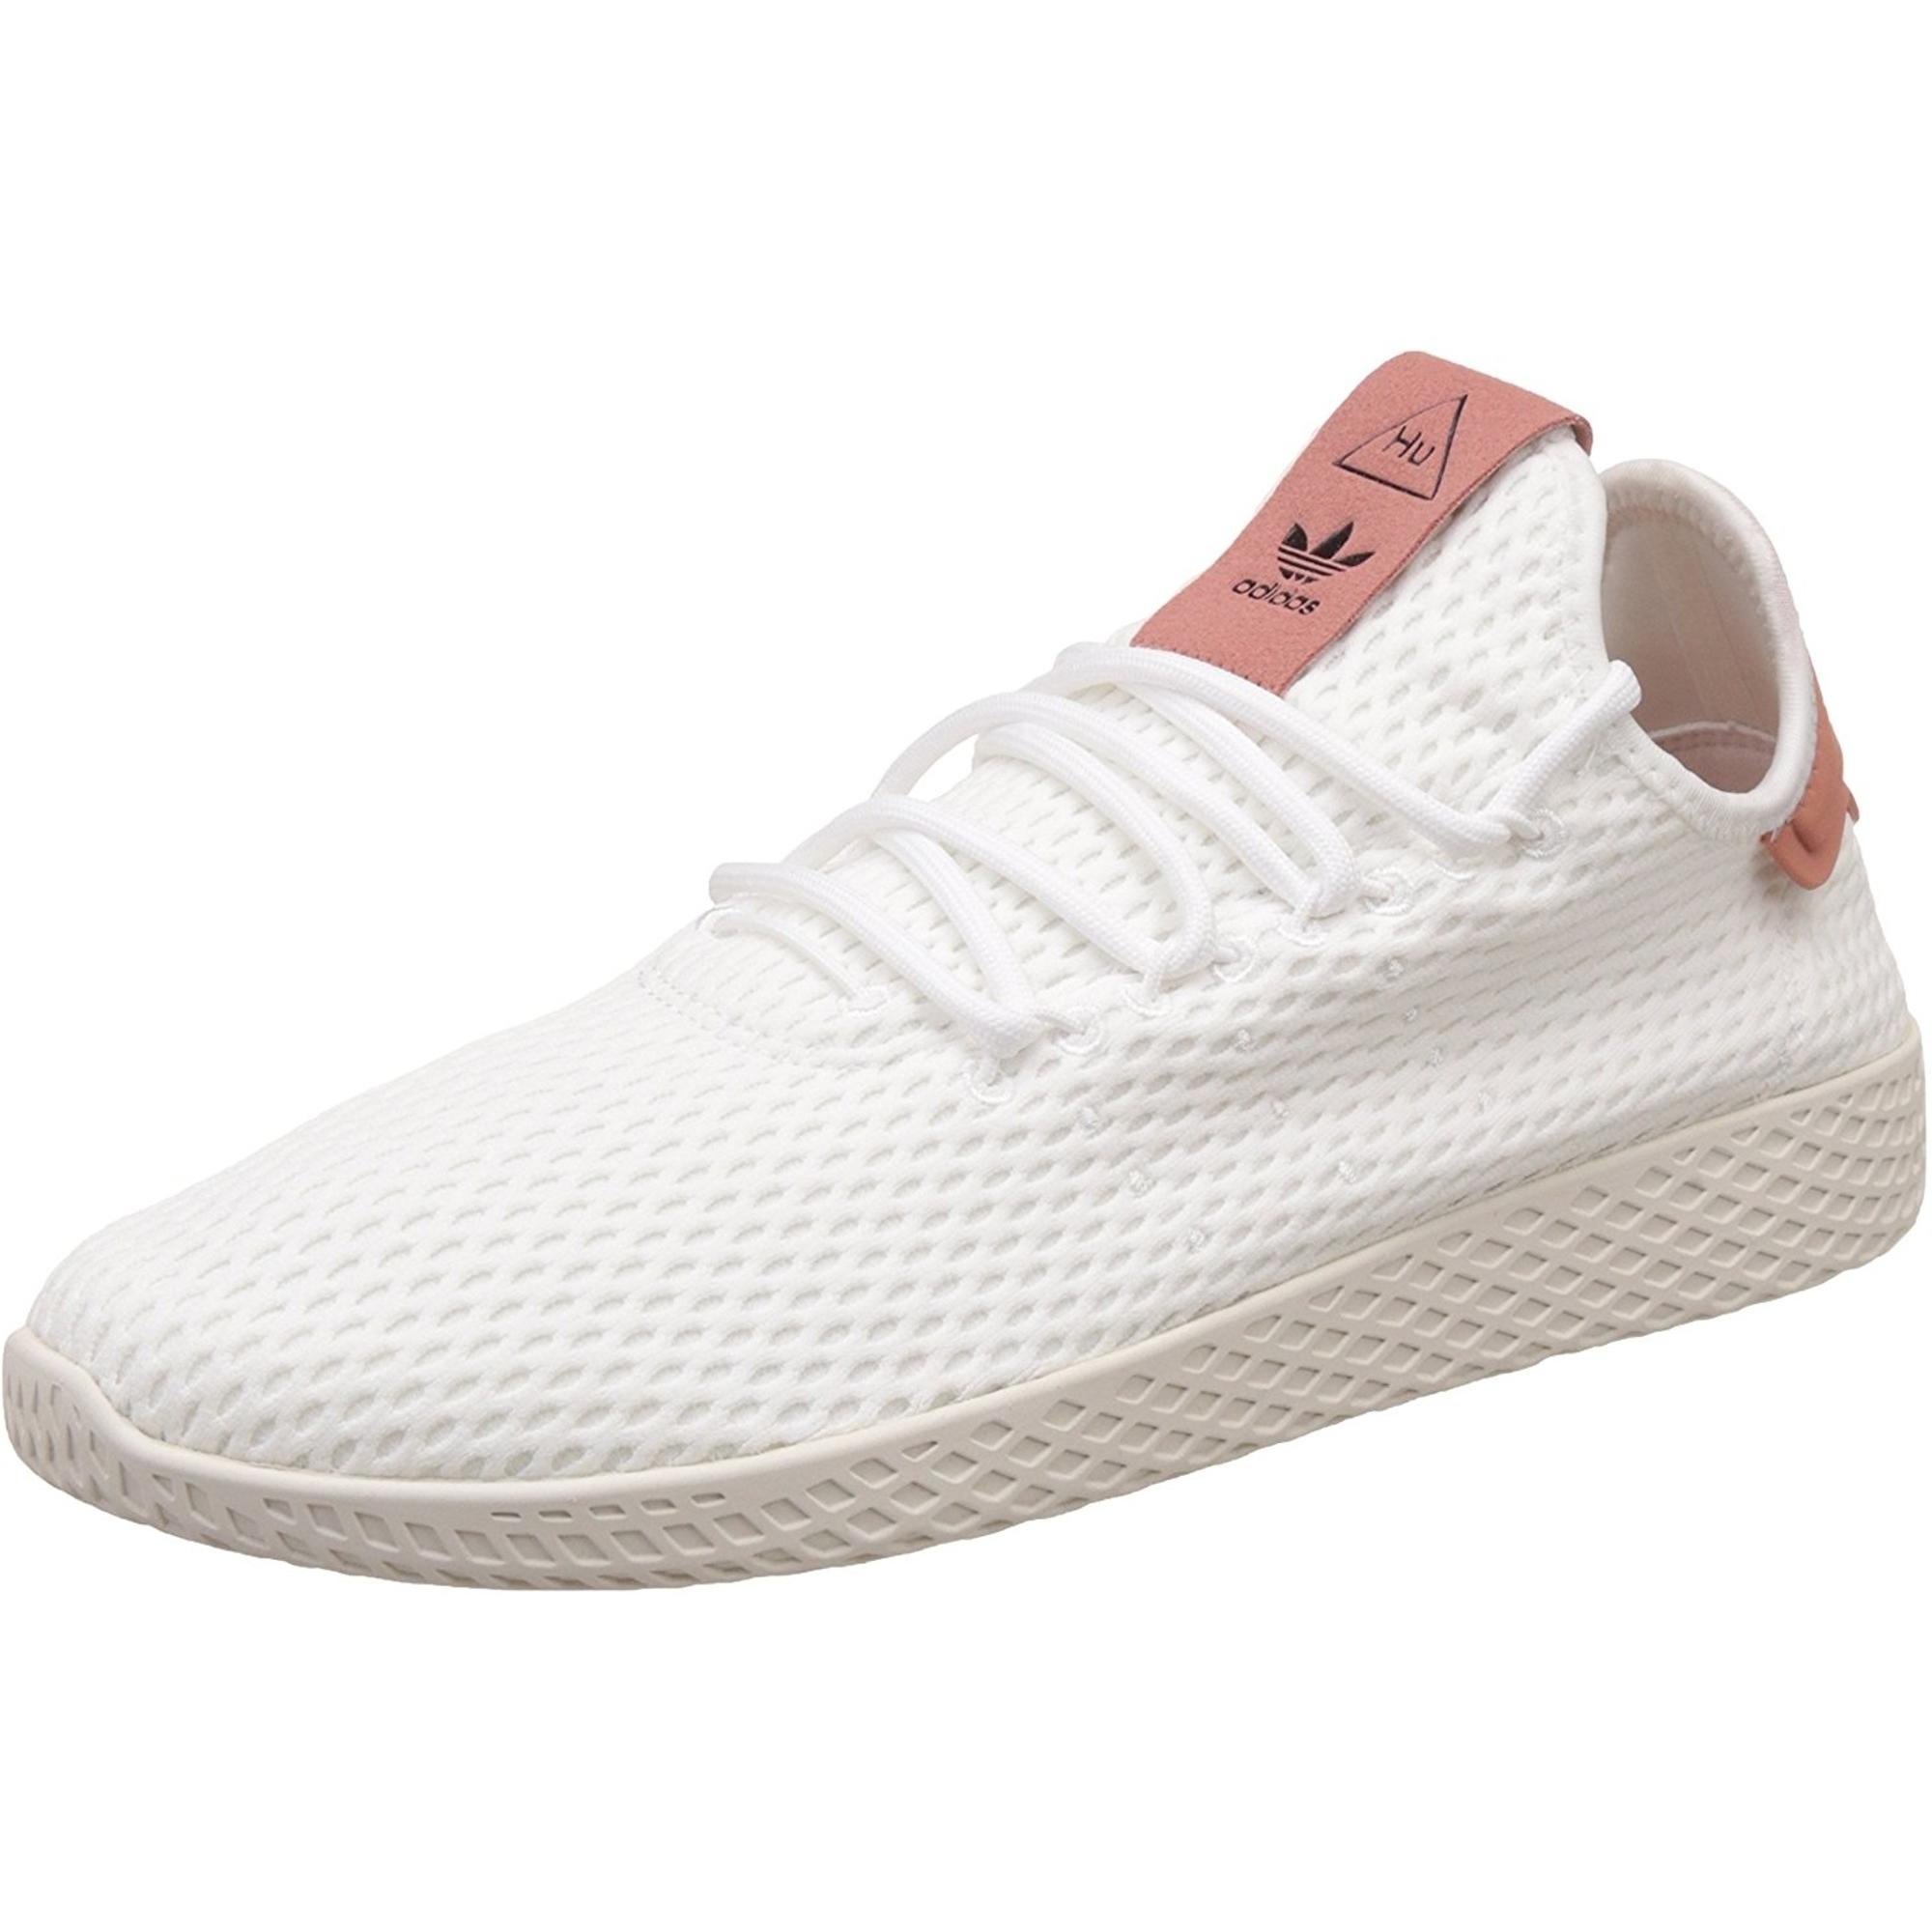 bianca and pink pharrell adidas